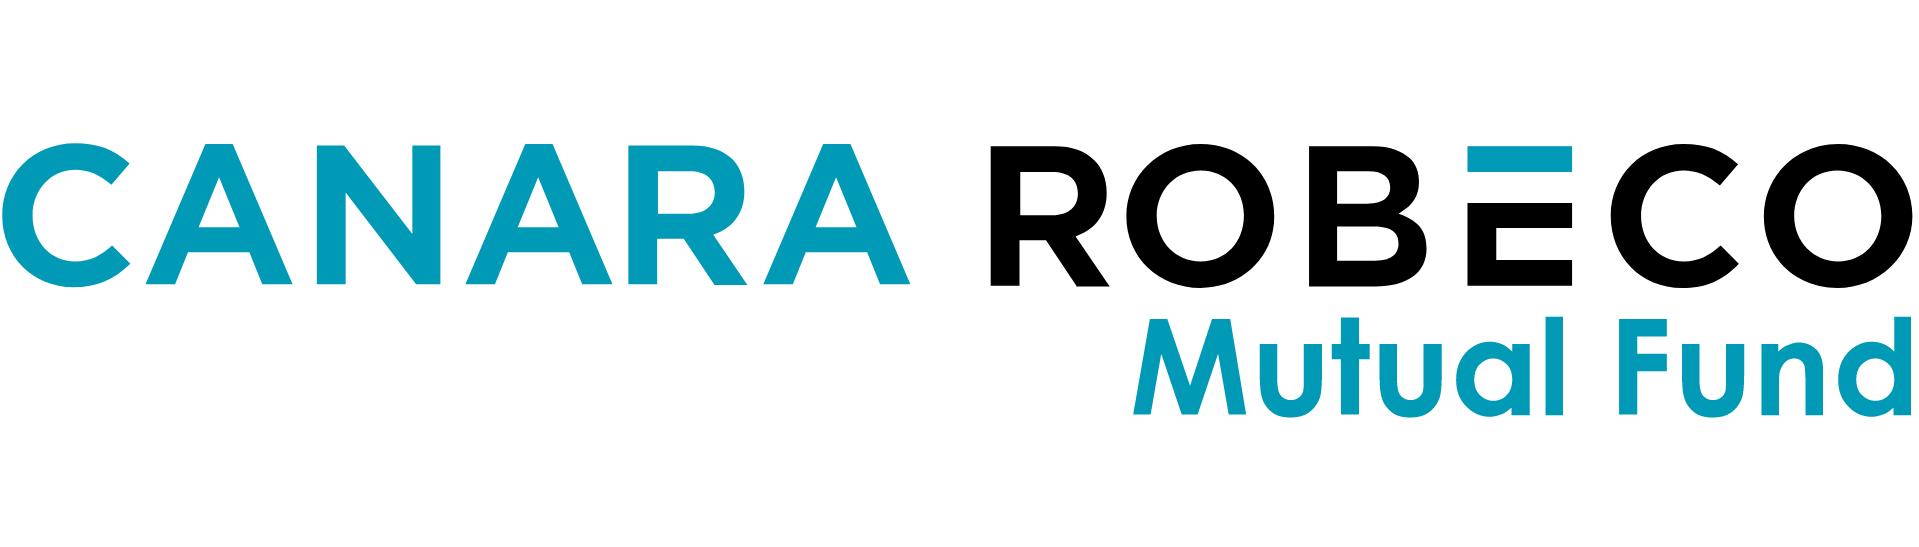 Canara Robeco Equity Tax Saver Fund - Regular Plan | Expense Ratio: 2.32 percent | 1-year Return: 11.97 percent | Net Assets: Rs 979 crore